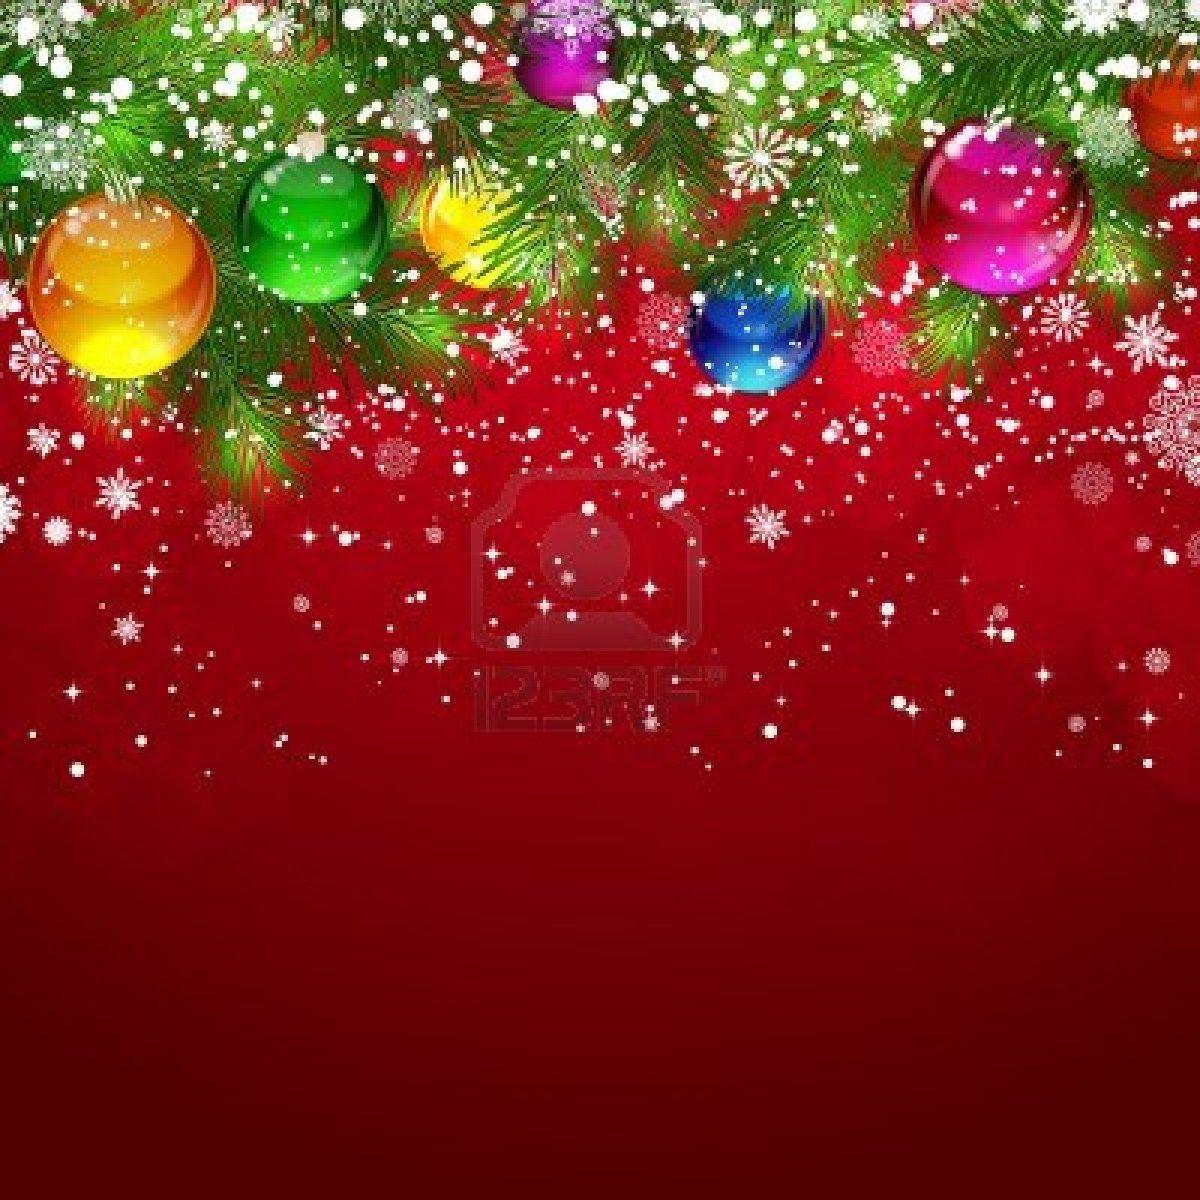 Animated Christmas Wallpapers Free Wallpaperpulse 1200x1200